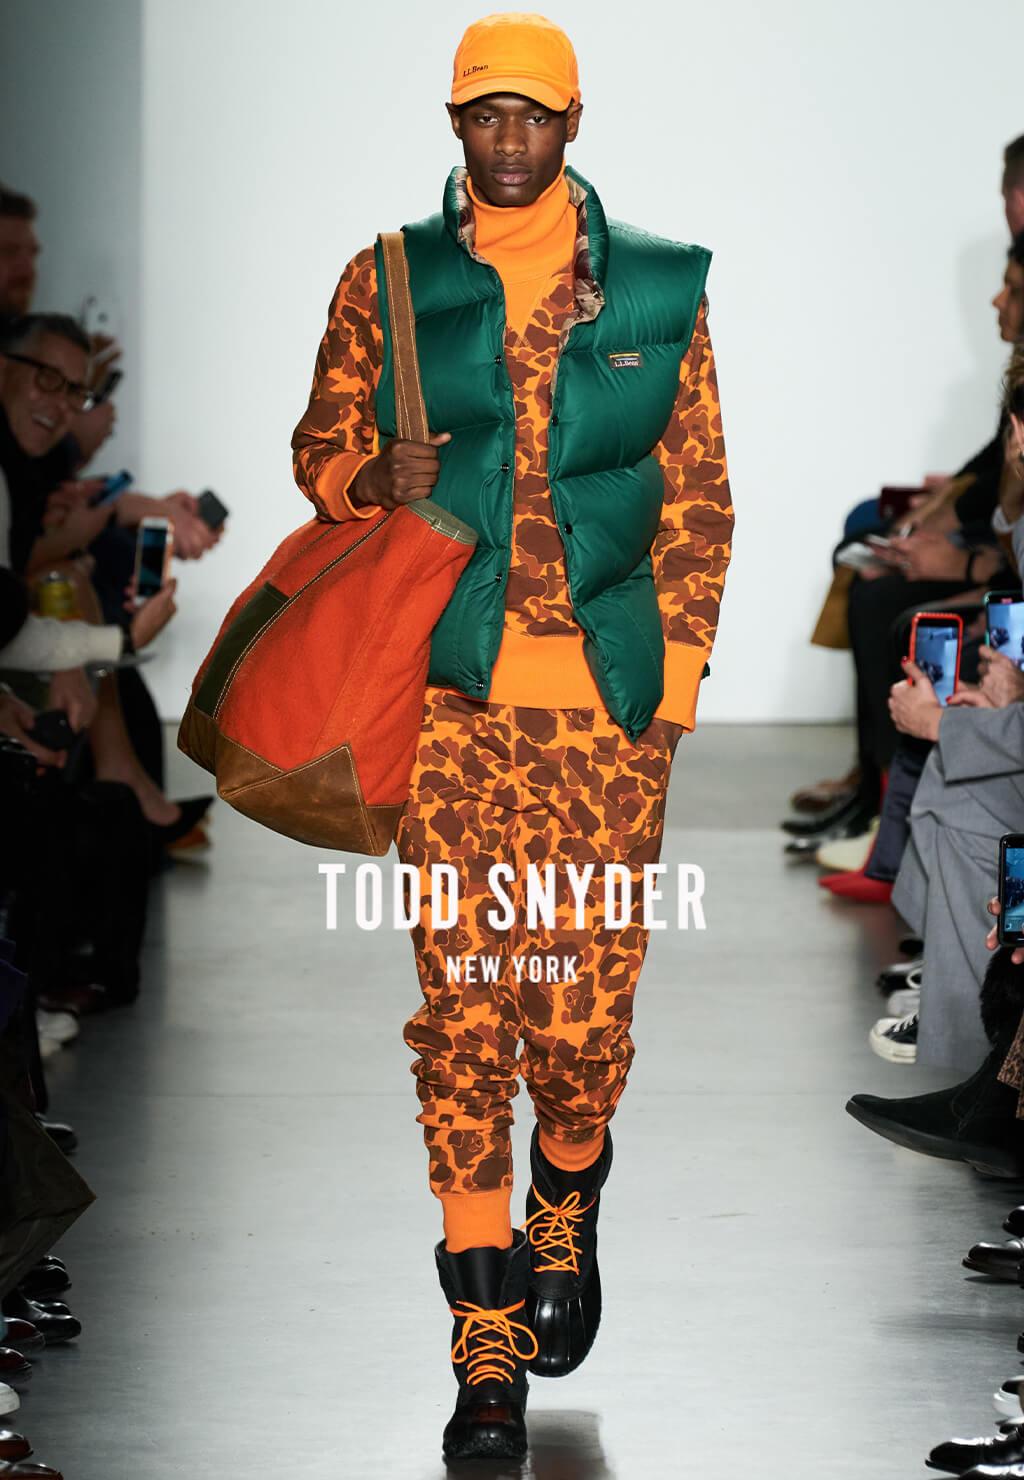 LOGO-Todd Snyder NY - 2020